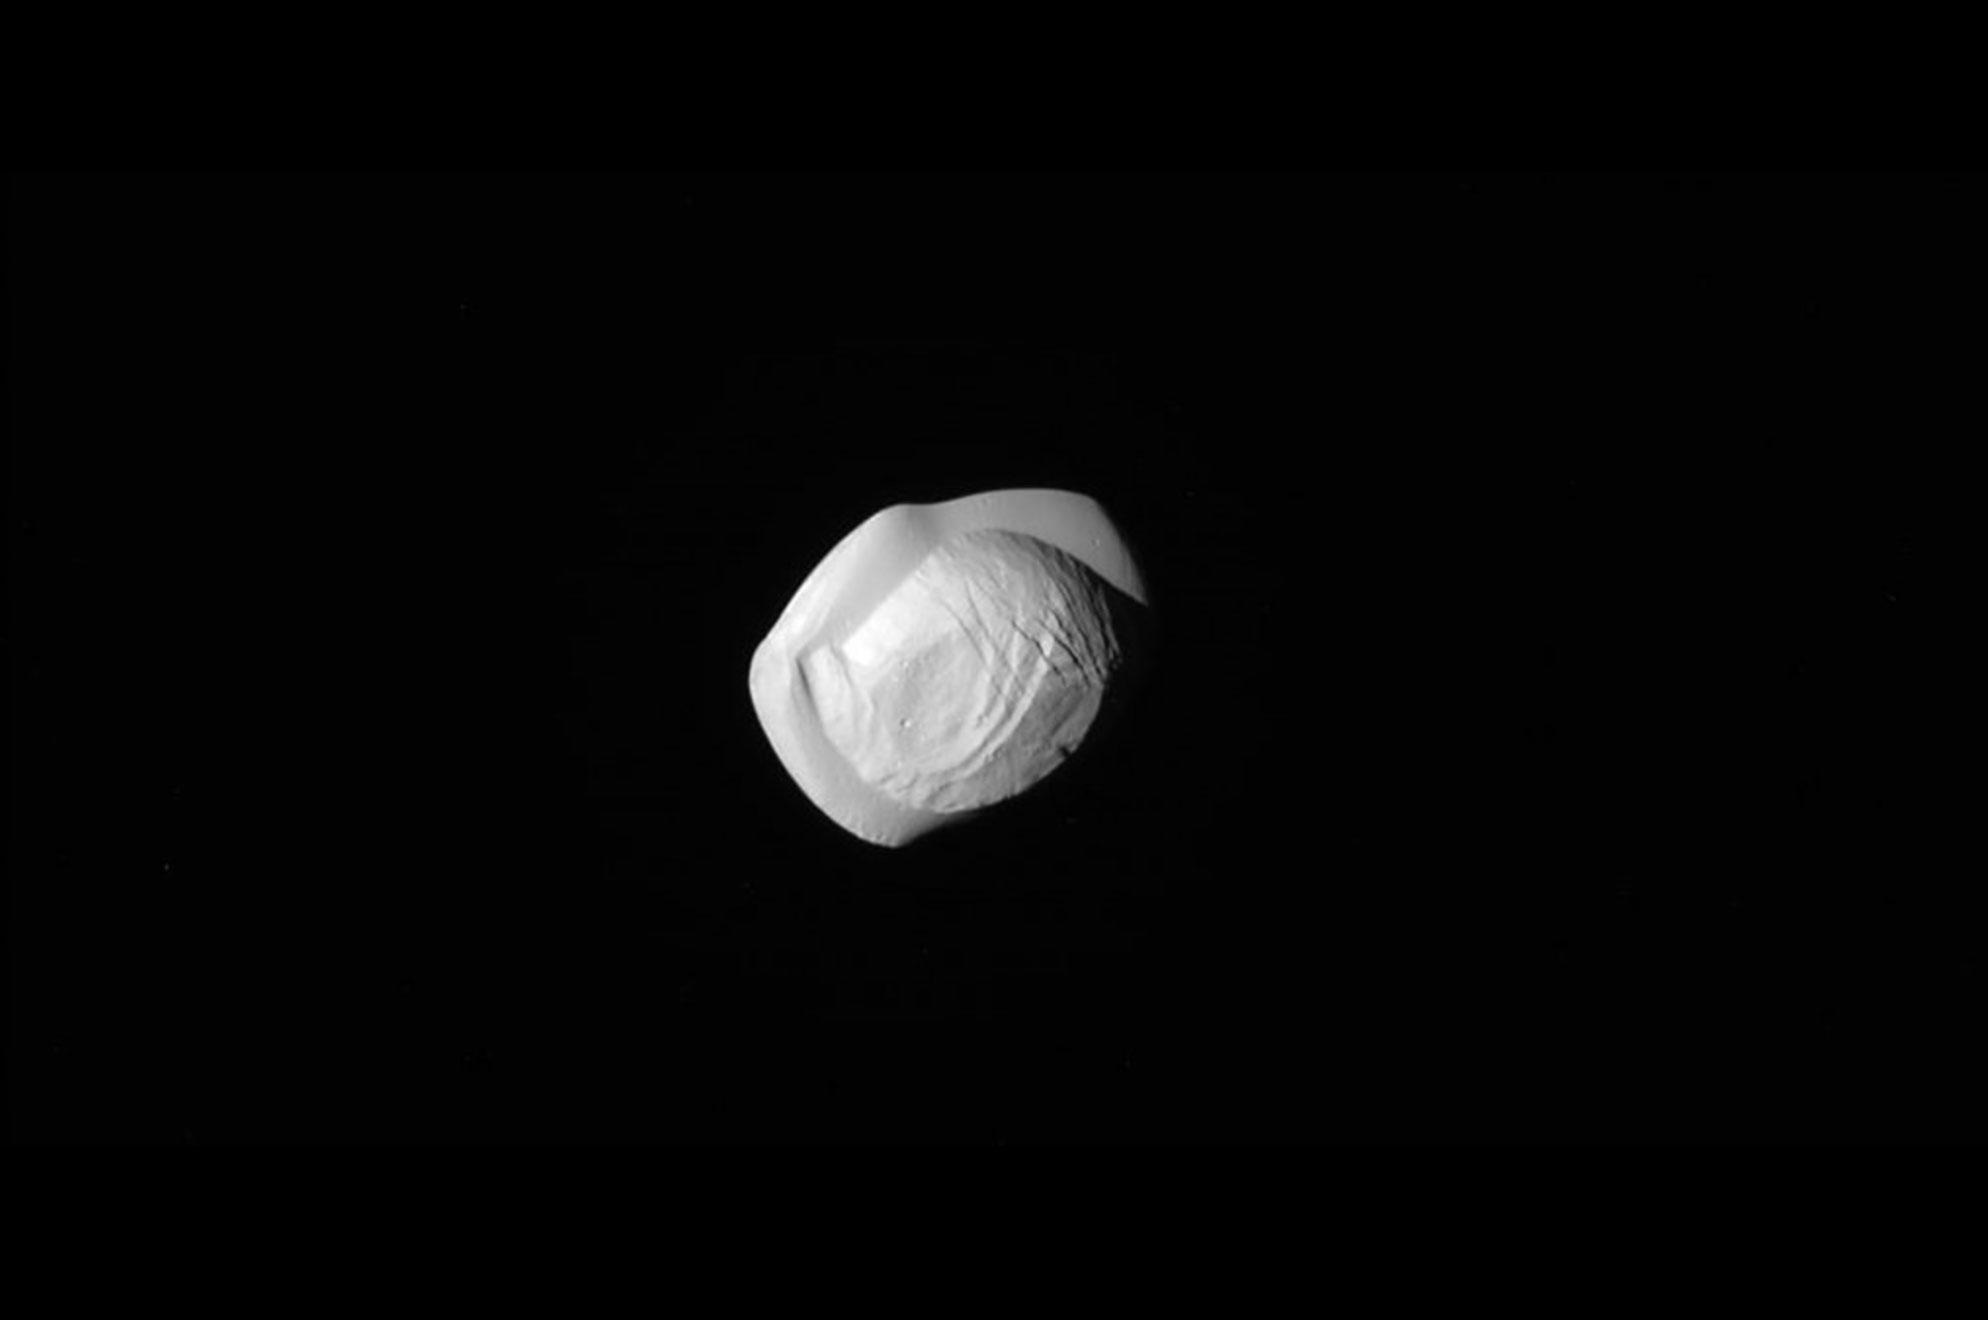 قمر کوچک سیاره زحل